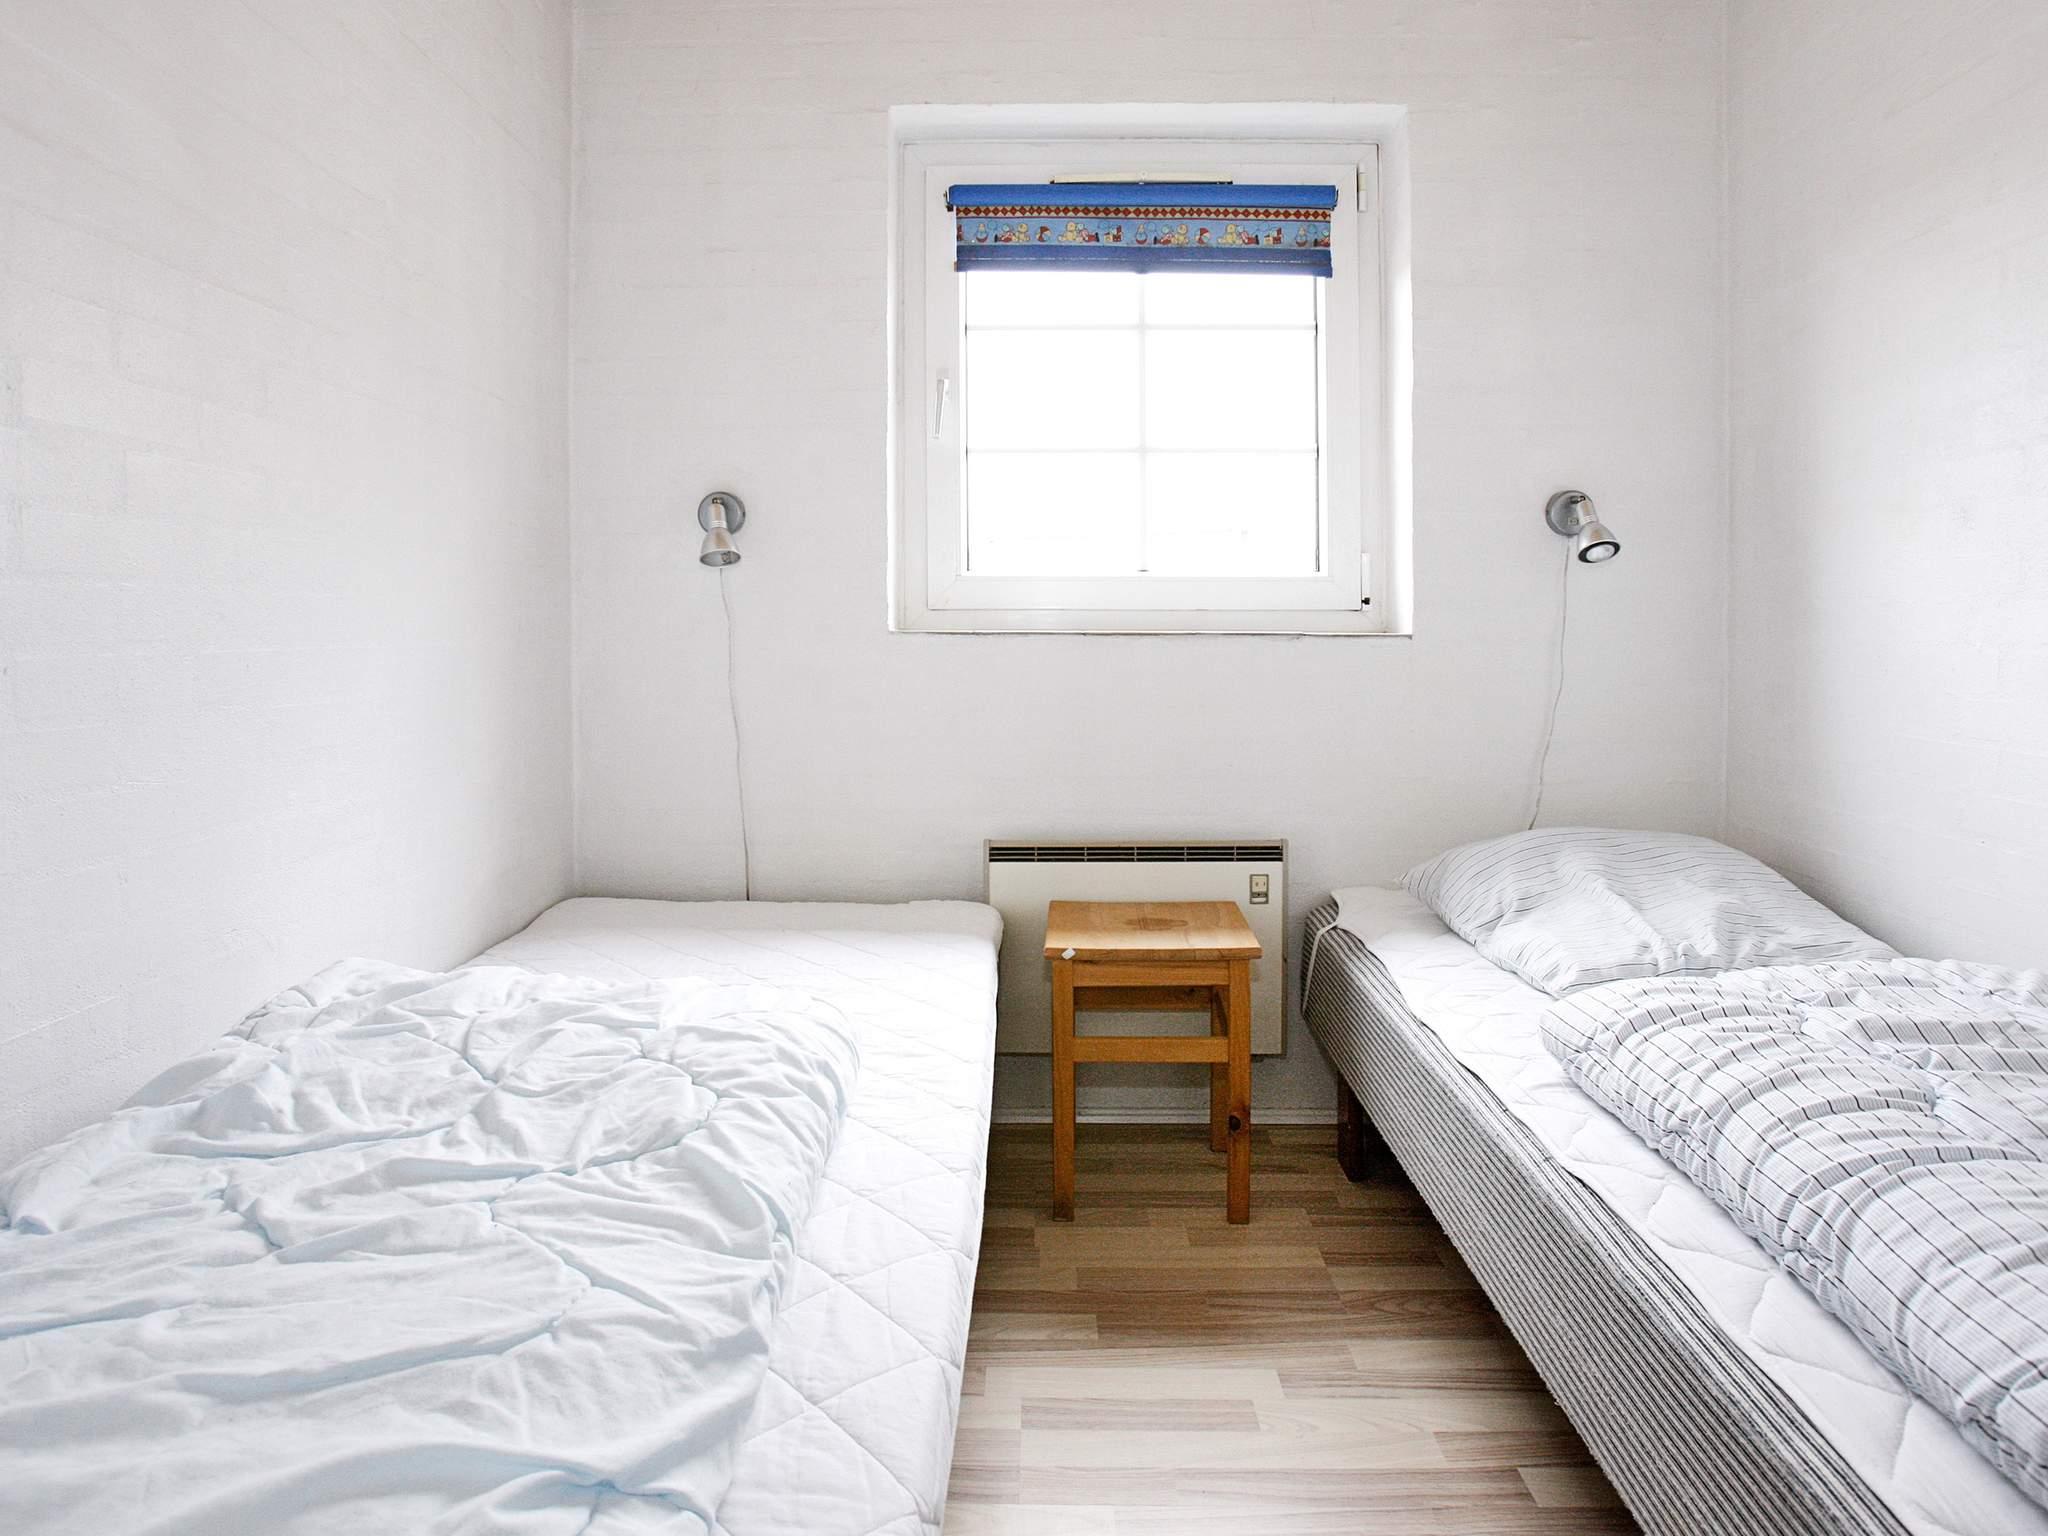 Ferienhaus Vrist (88916), Vrist, , Limfjord, Dänemark, Bild 13